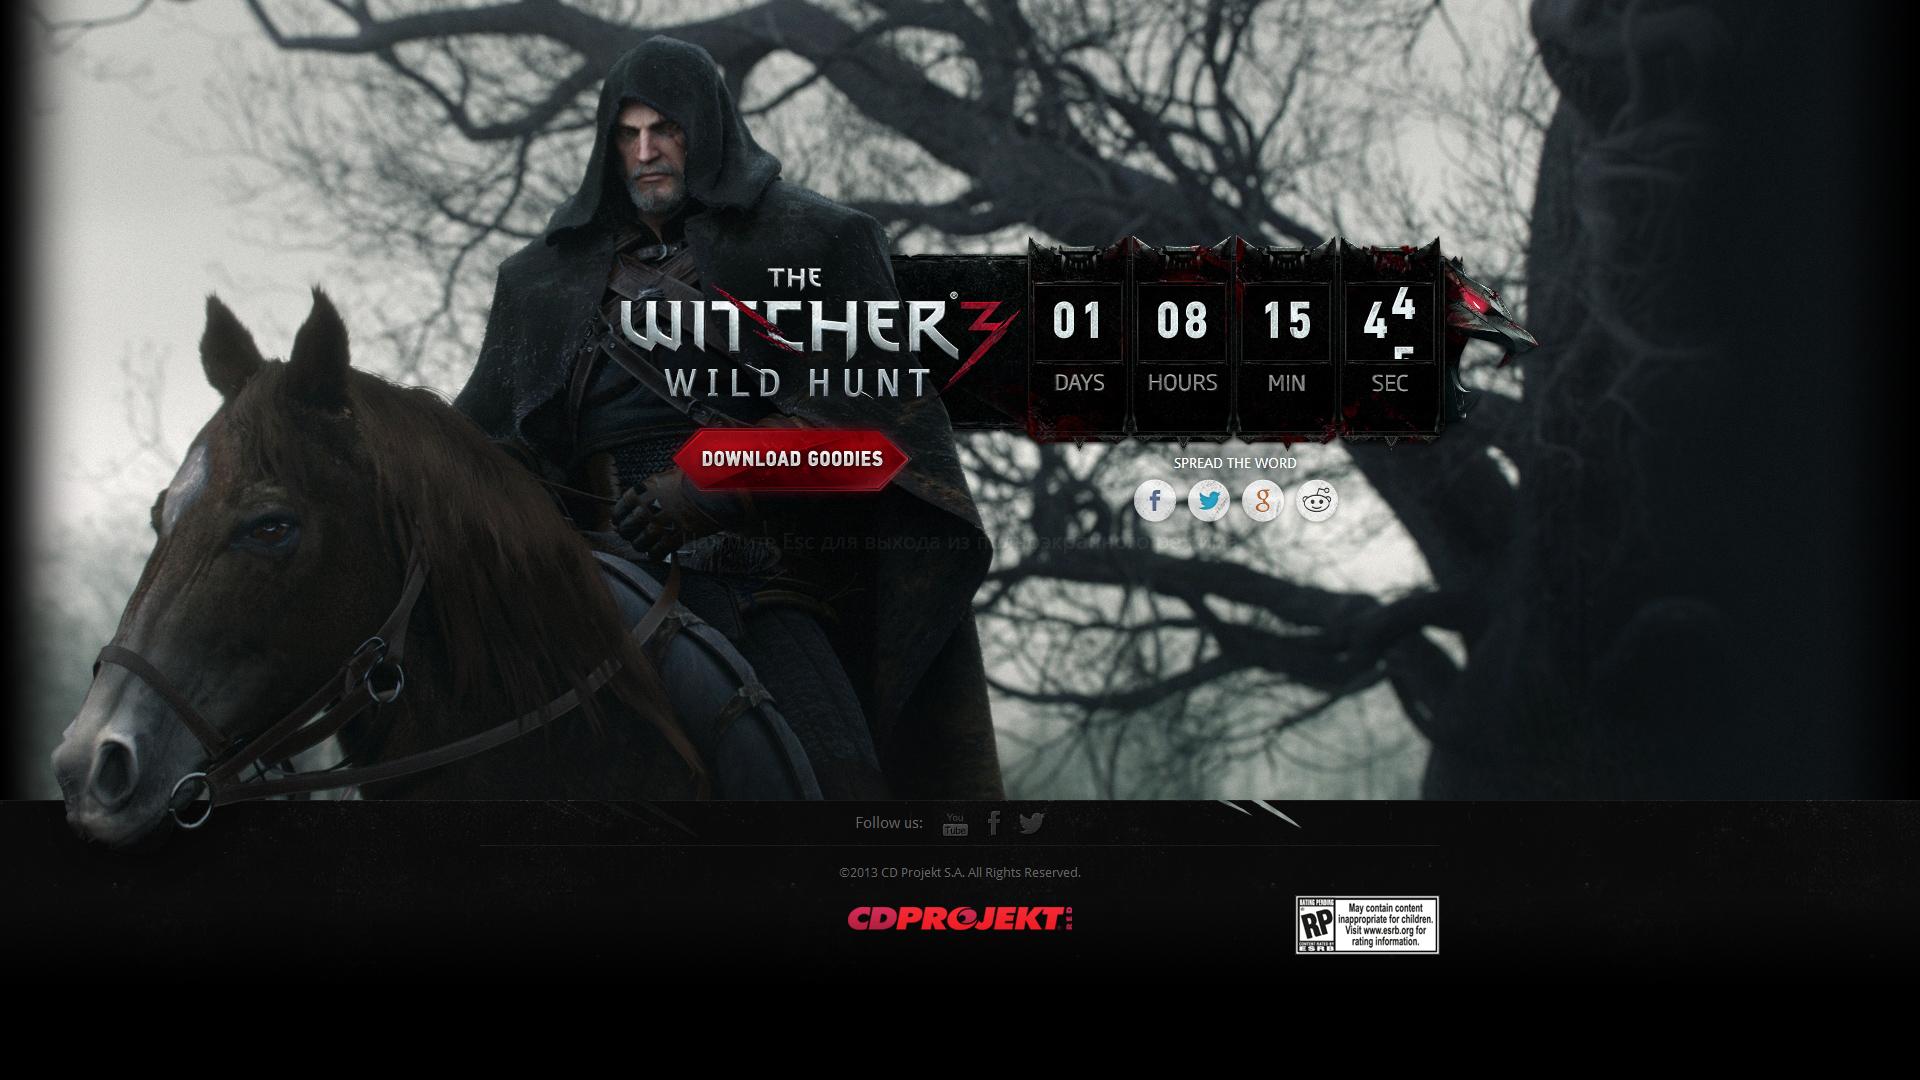 Запущен мистический таймер для The Witcher 3: Wild Hunt - Изображение 1